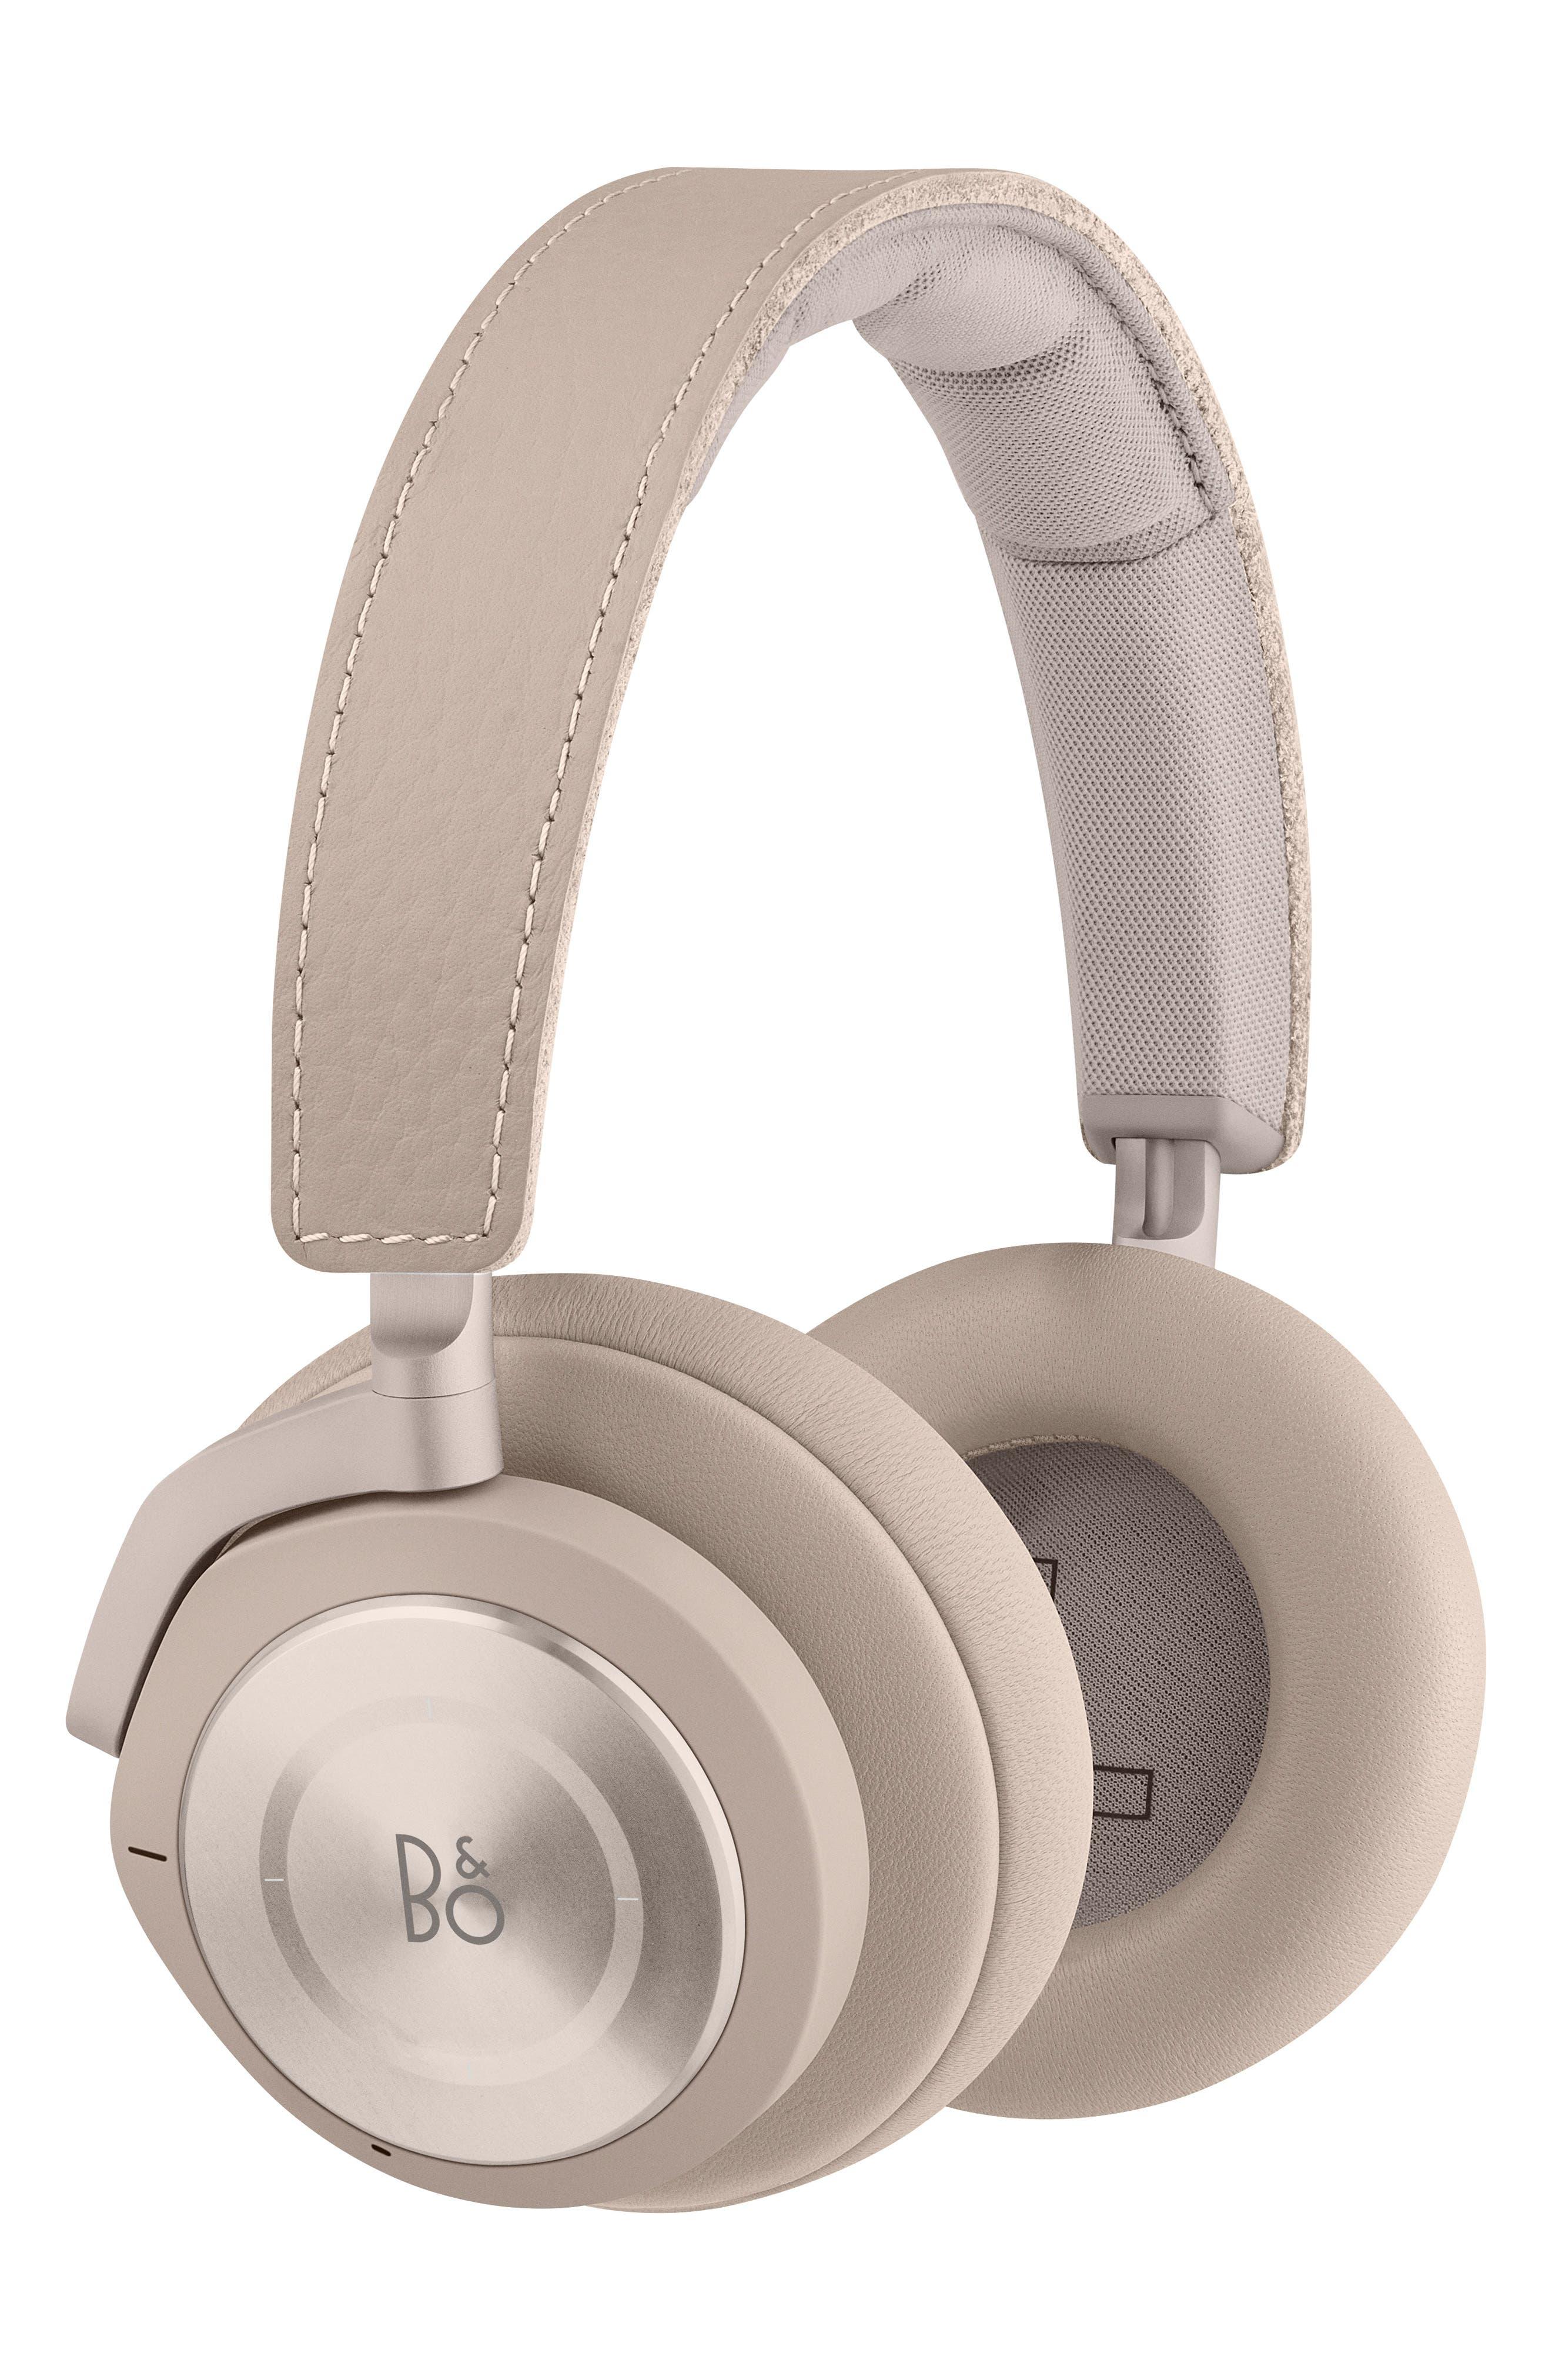 H9I Wireless Noise Canceling On-Ear Headphones,                             Alternate thumbnail 2, color,                             LIMESTONE